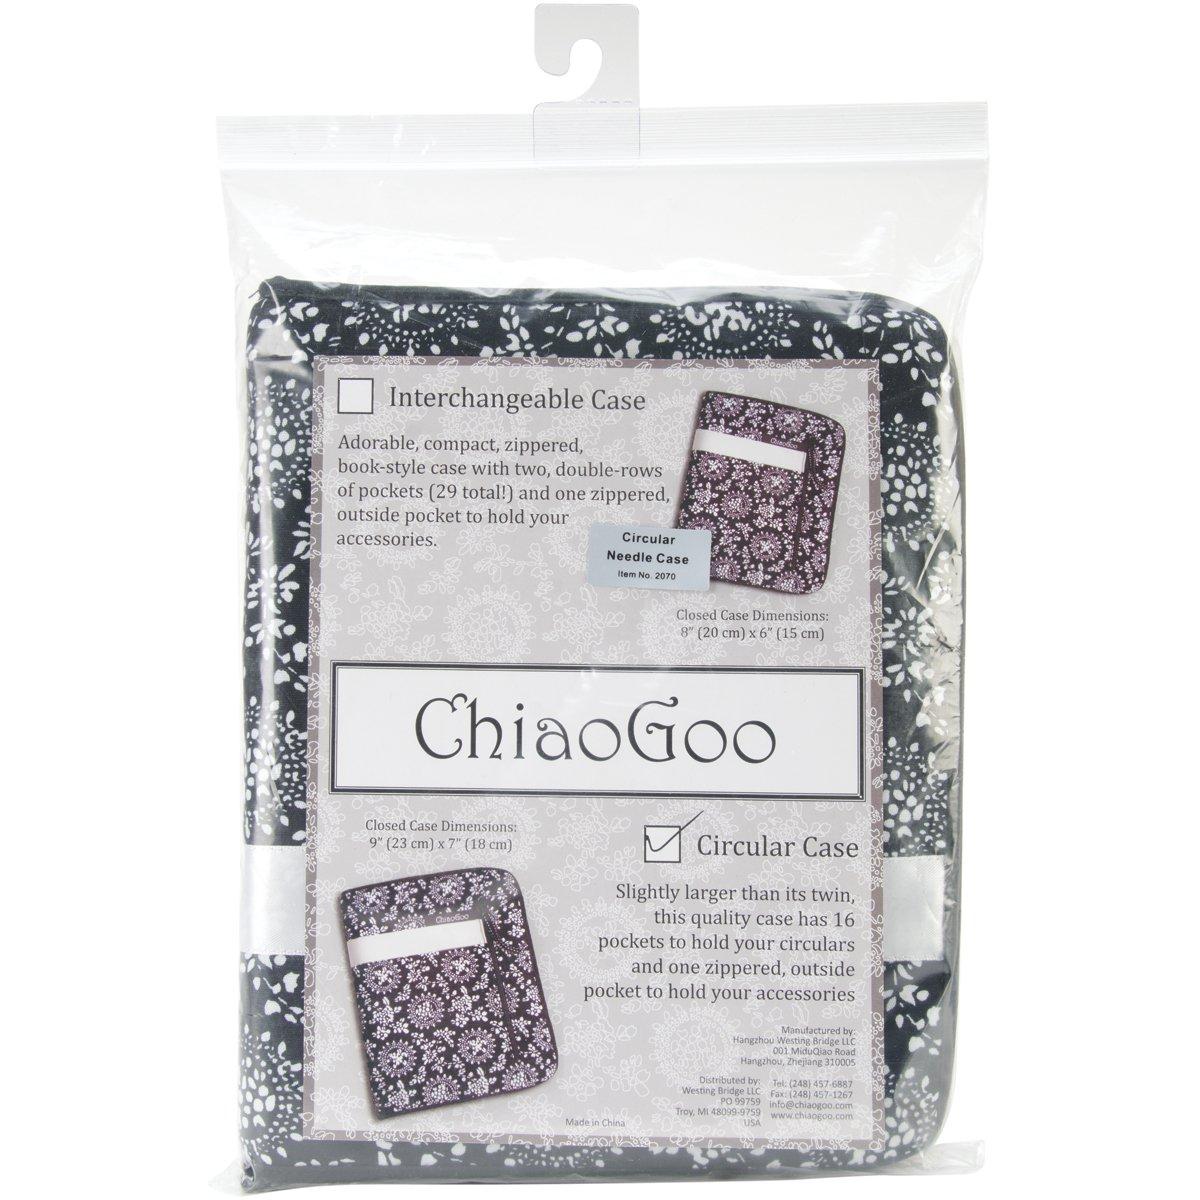 B00QXKA7QI ChiaoGoo White Ribbon Circular Needle Case 71qbMj-2BPWL